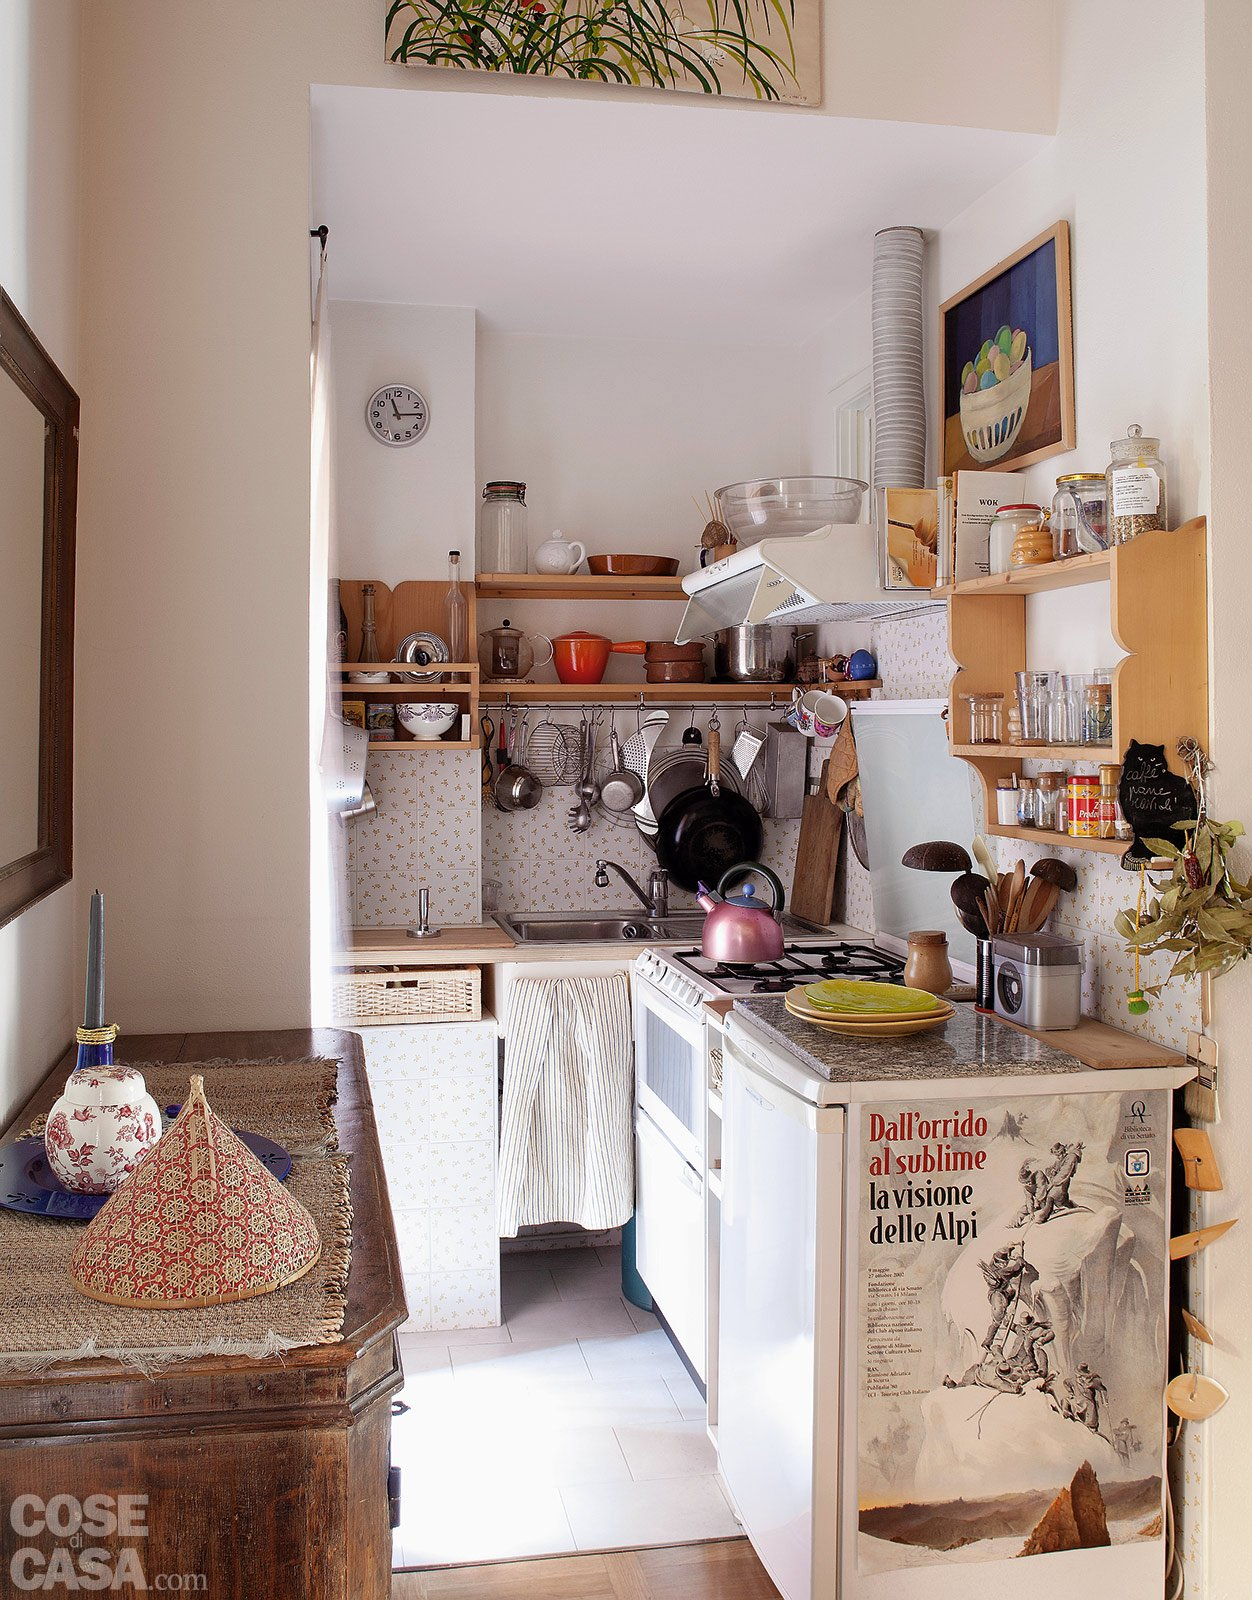 Bilocale di 40 mq una casa fai da te cose di casa for Oggetti fai da te per arredare casa